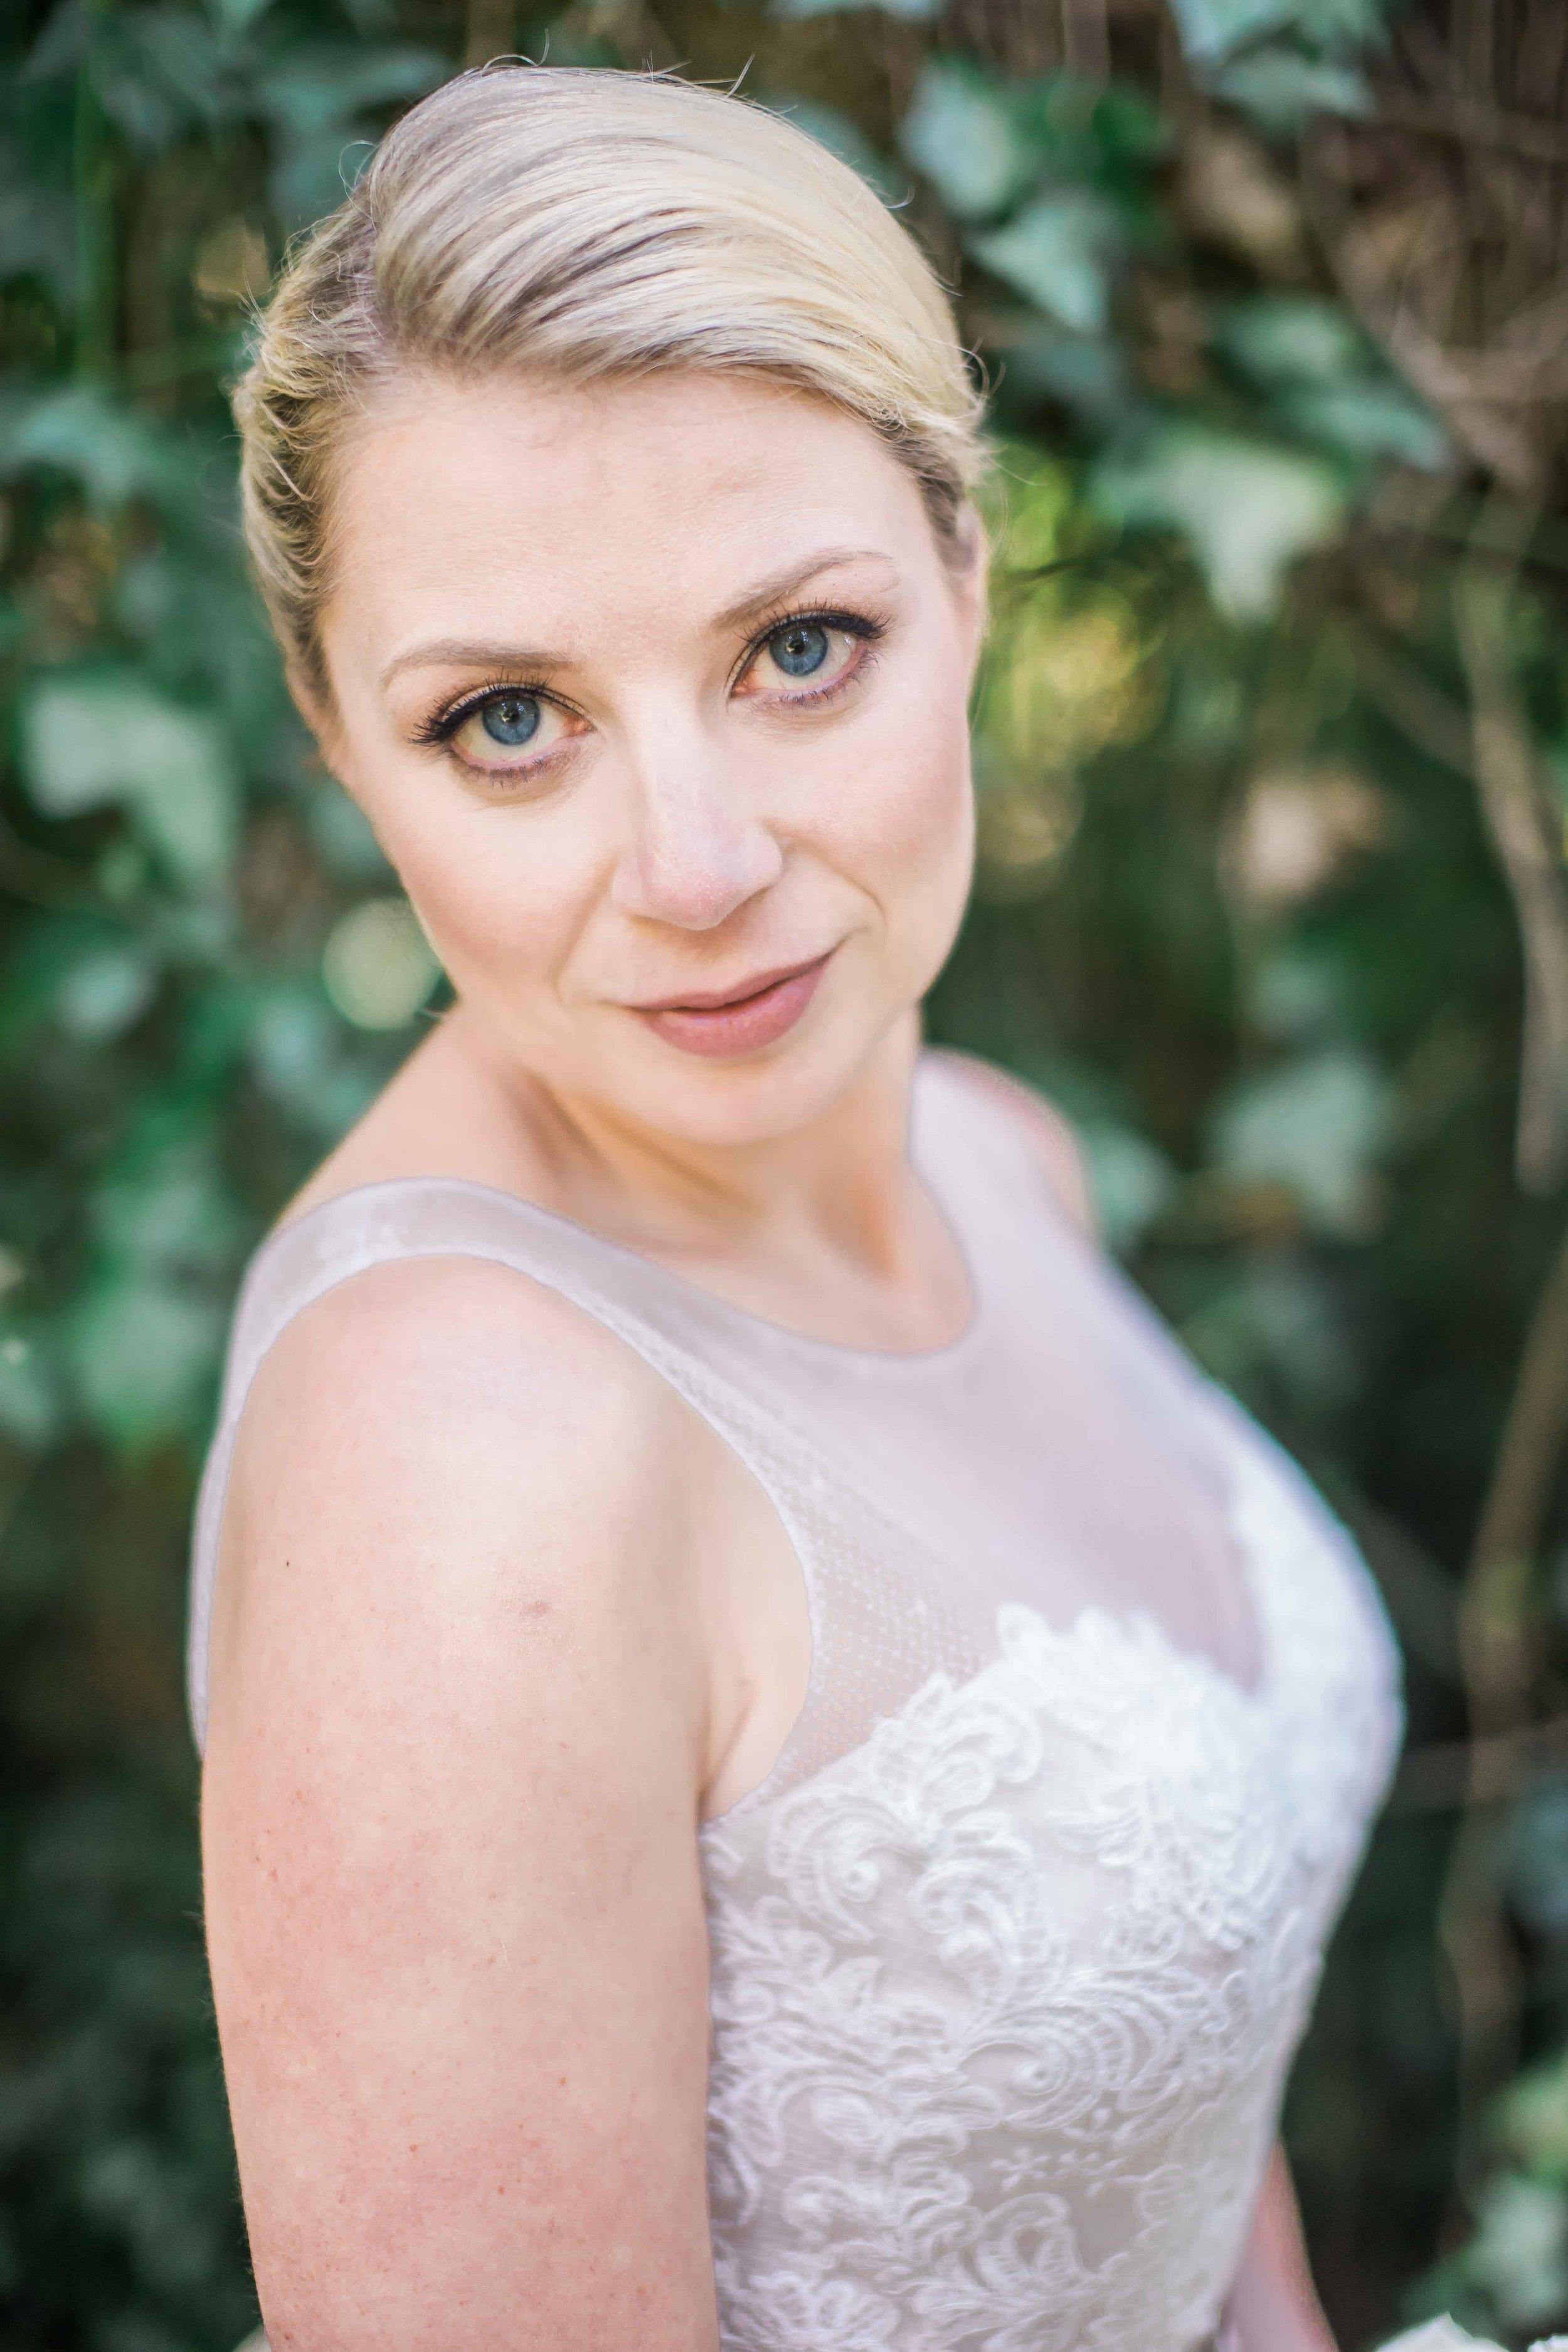 ChrisandAnja_WEDDING_Brienne_Michelle_Photography_263.JPG